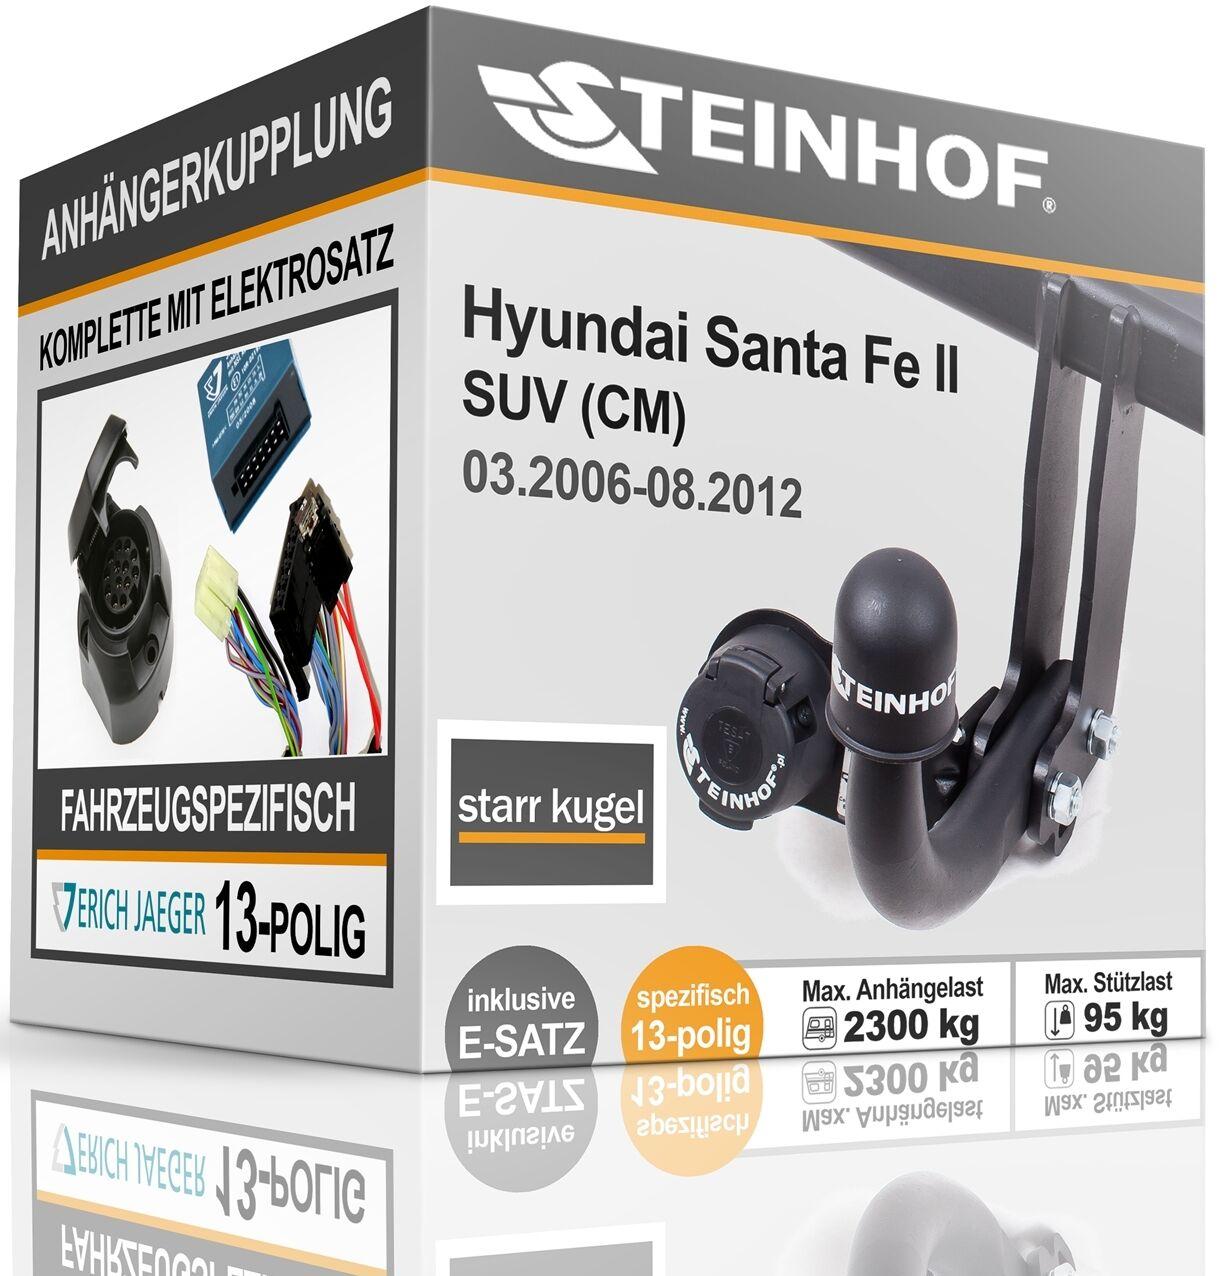 7-pol E-Satz Für Hyundai Santa Fe 06-12 Anhängerkupplung starr